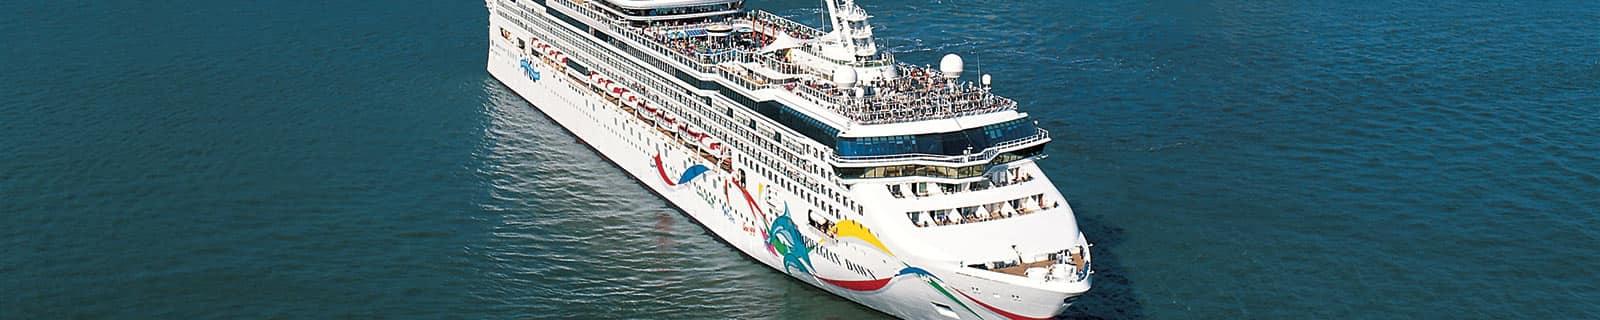 Norwegian Dawn Cruise Ship Norwegian Dawn Deck Plans Norwegian Cruise Line